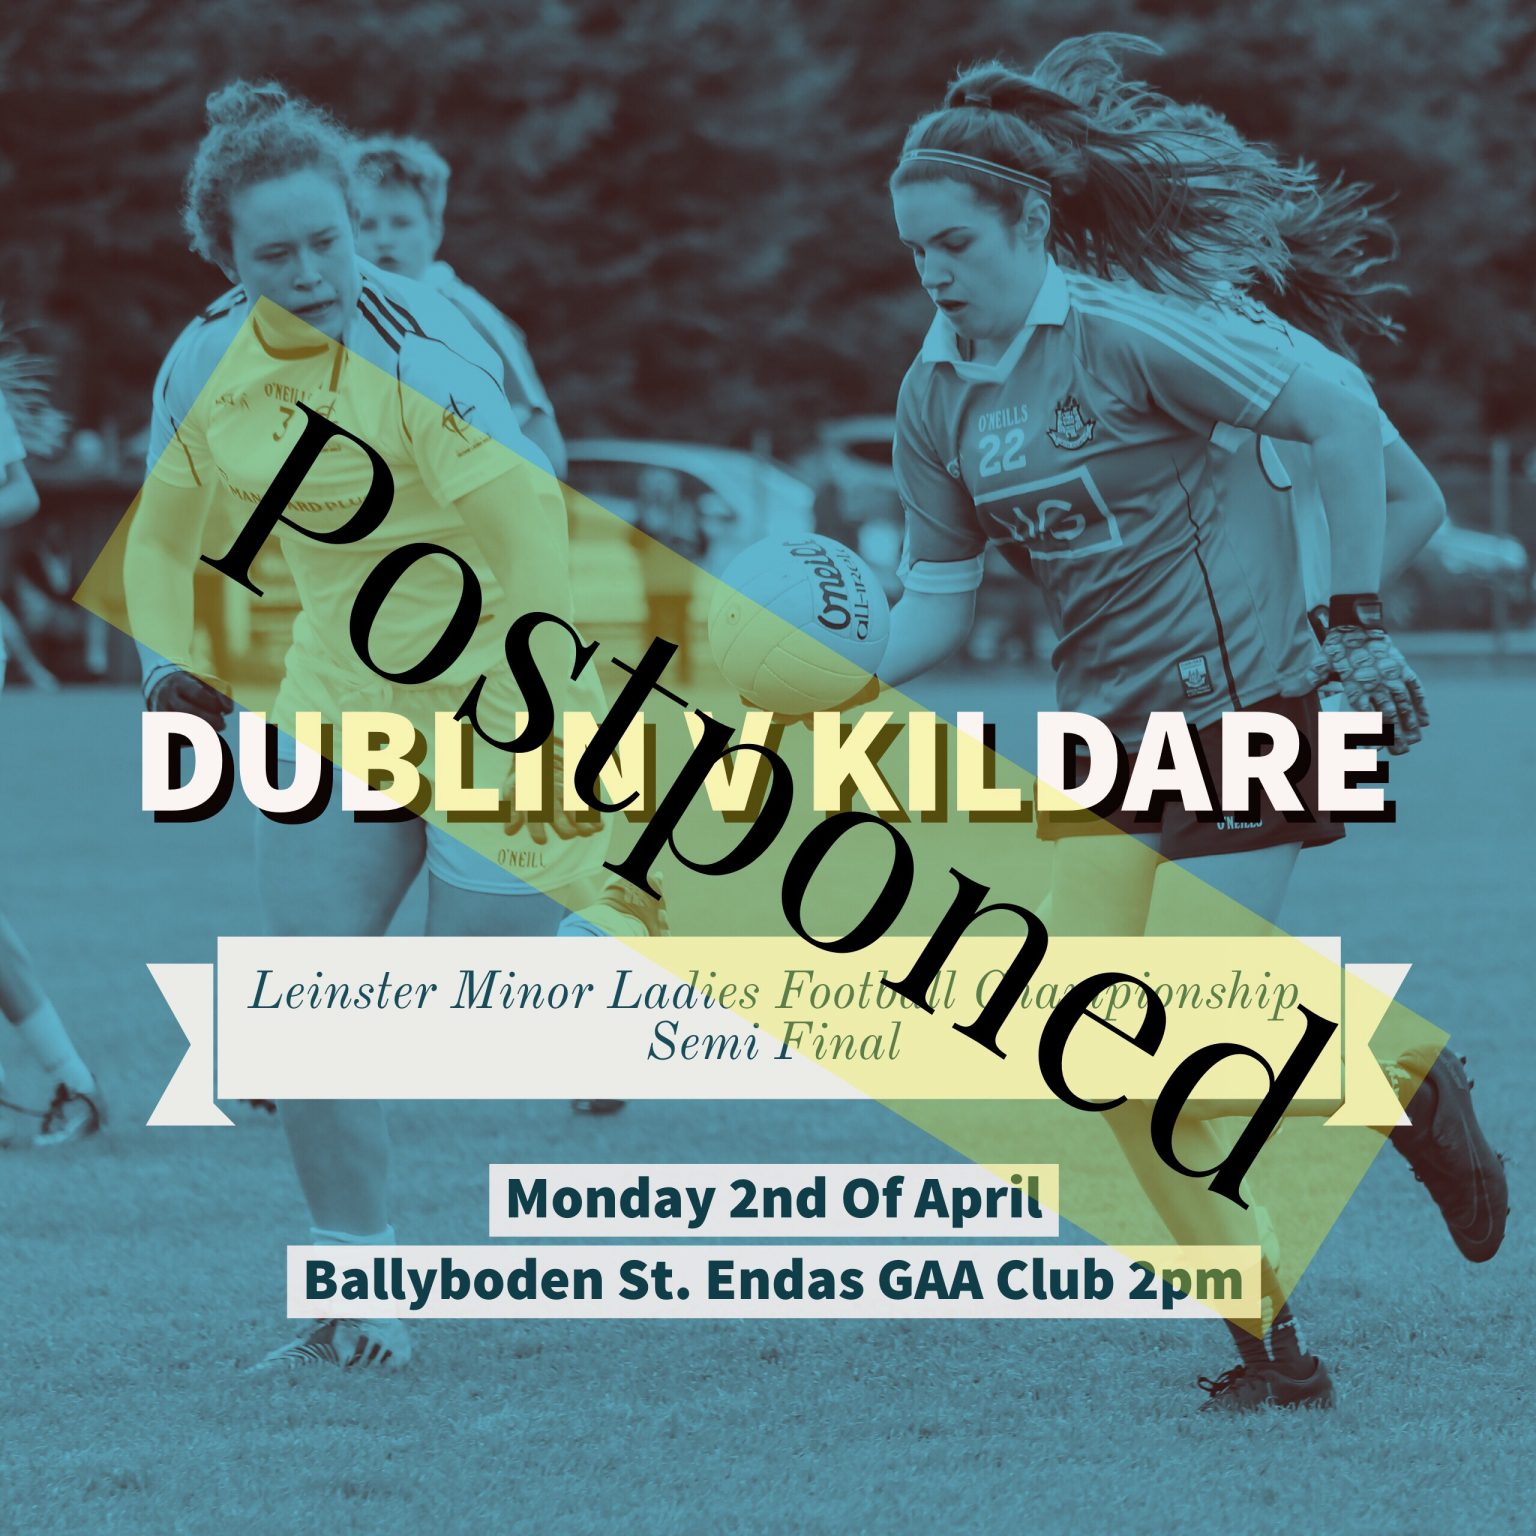 Dublin Minor Ladies Footballers Leinster Championship Semi Final Against Kildare Has Been Postponed